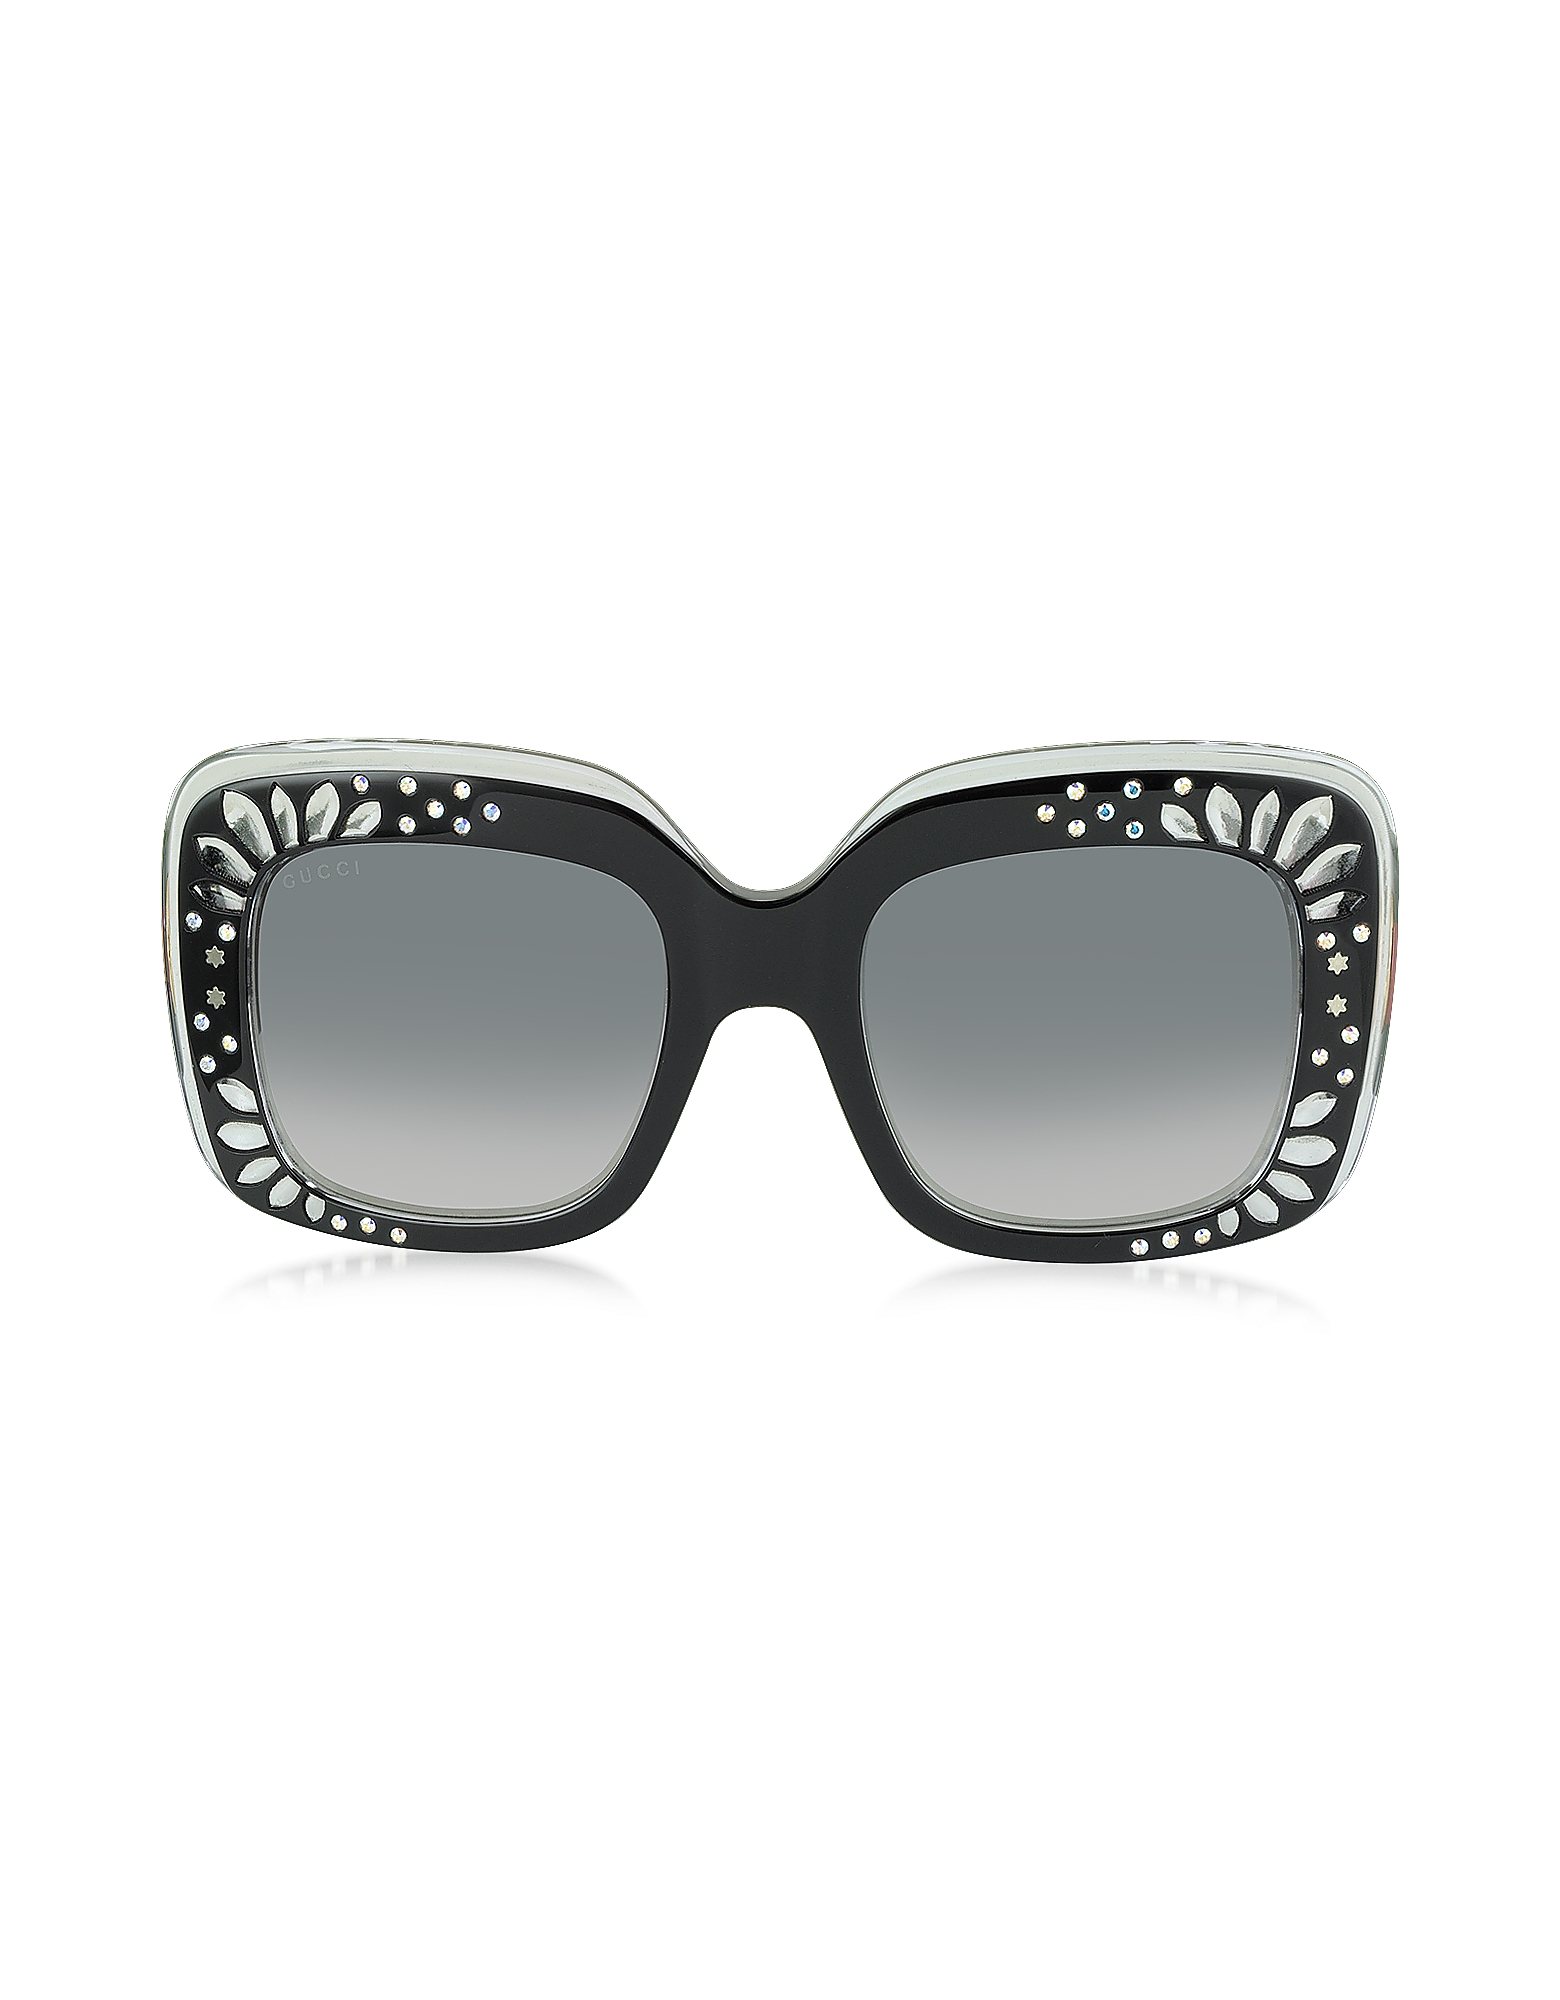 045a3ec1e5d Oversized Square Frame Bling Rhinestone Sunglasses Wholesale